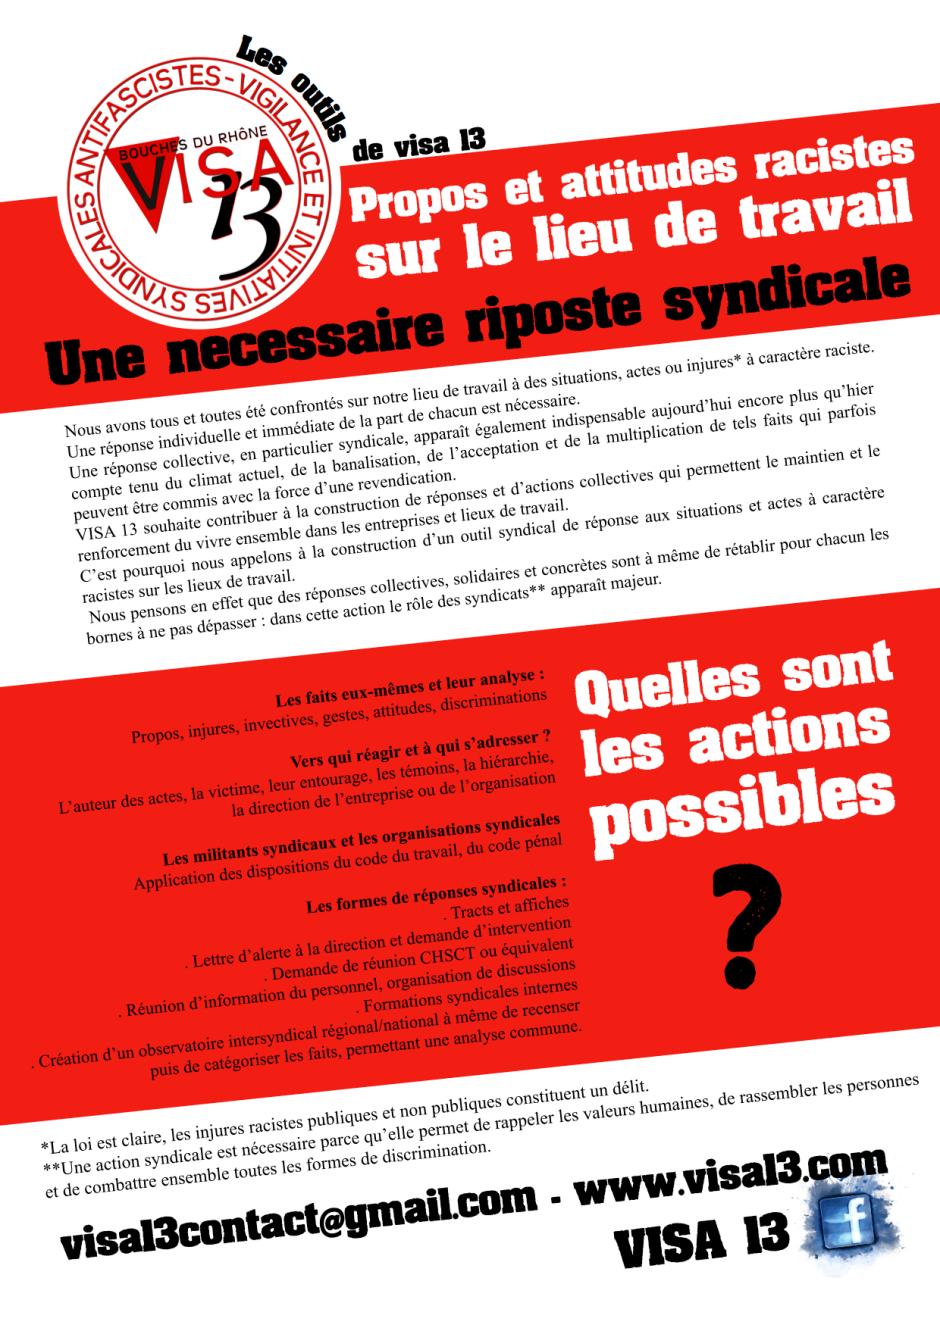 racisme-au-travail_visa-13